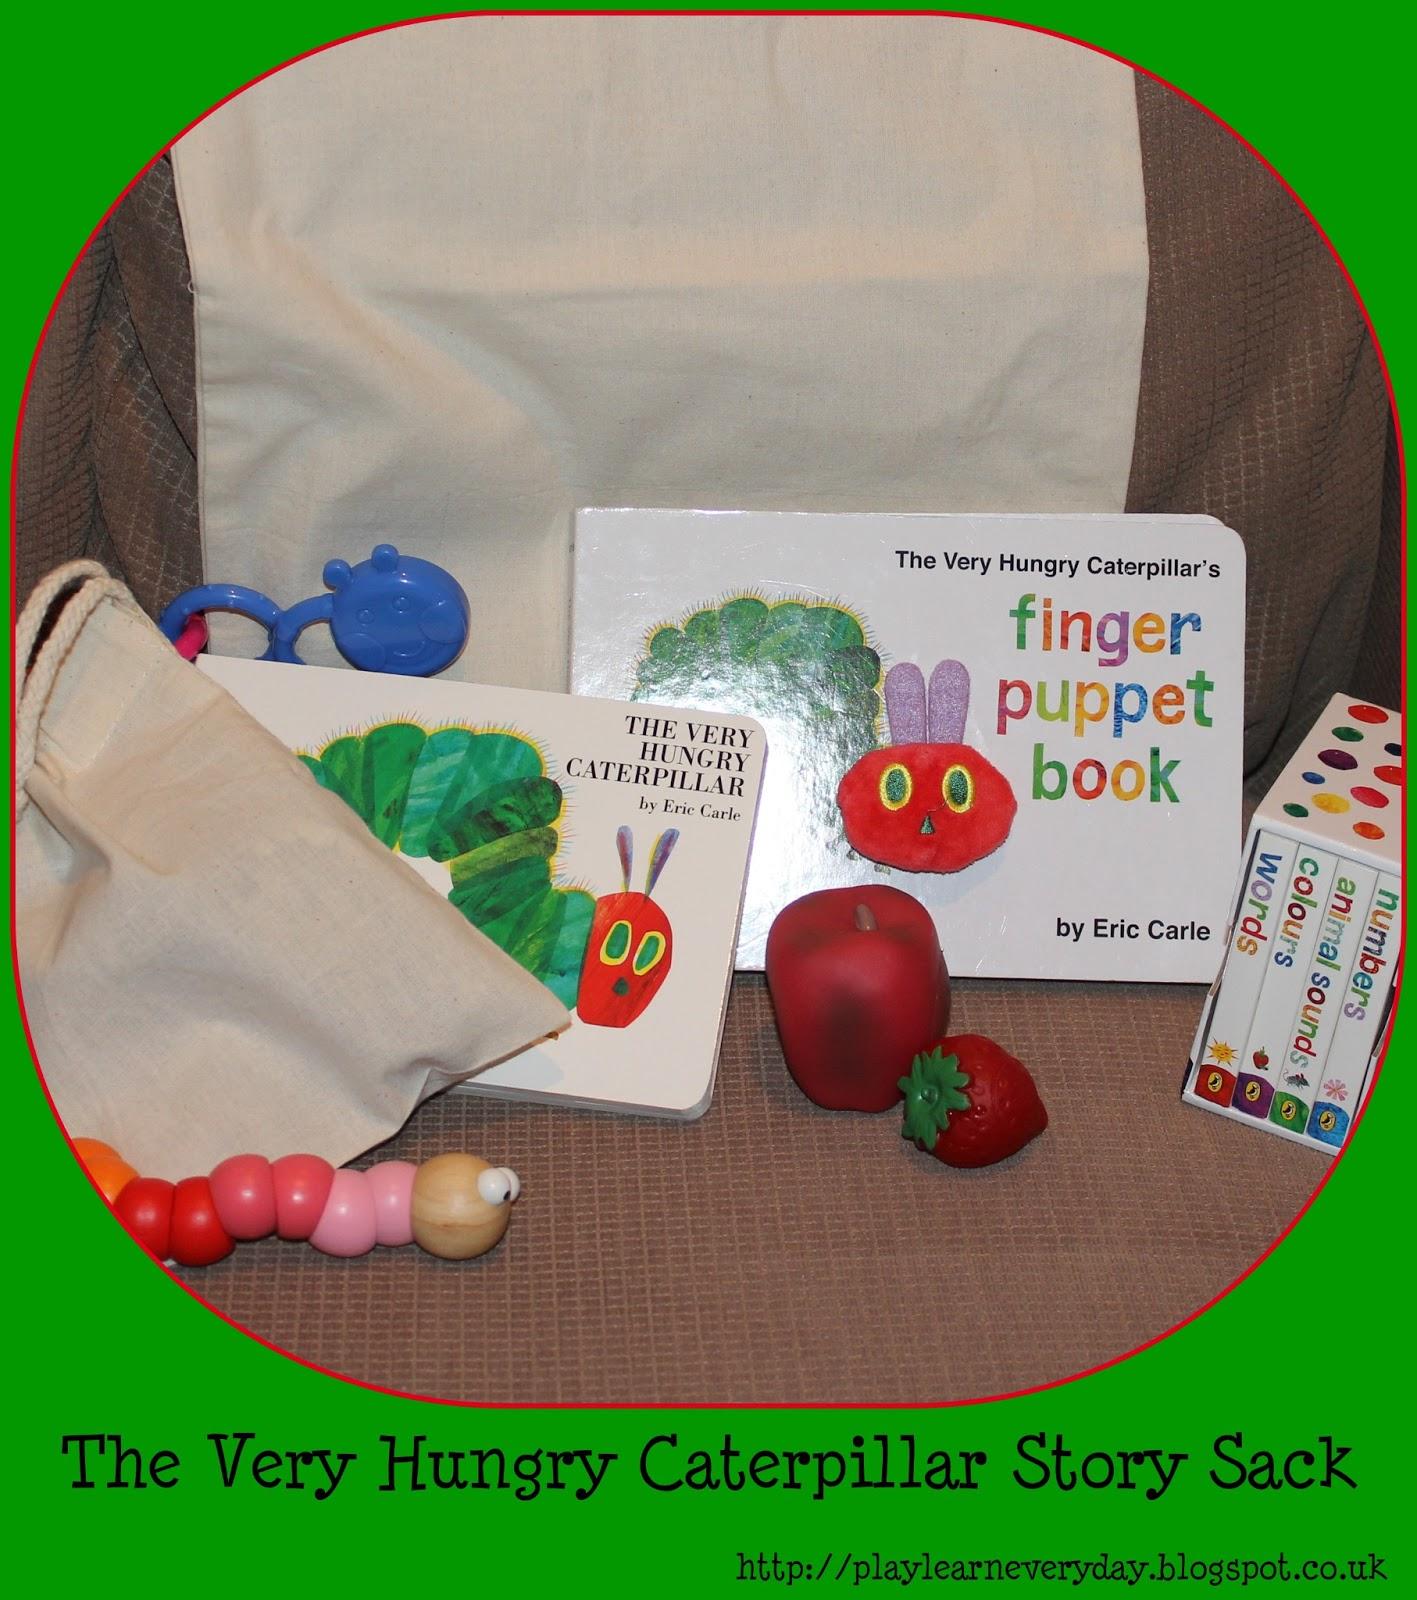 The very hungry caterpillar story sack jpg